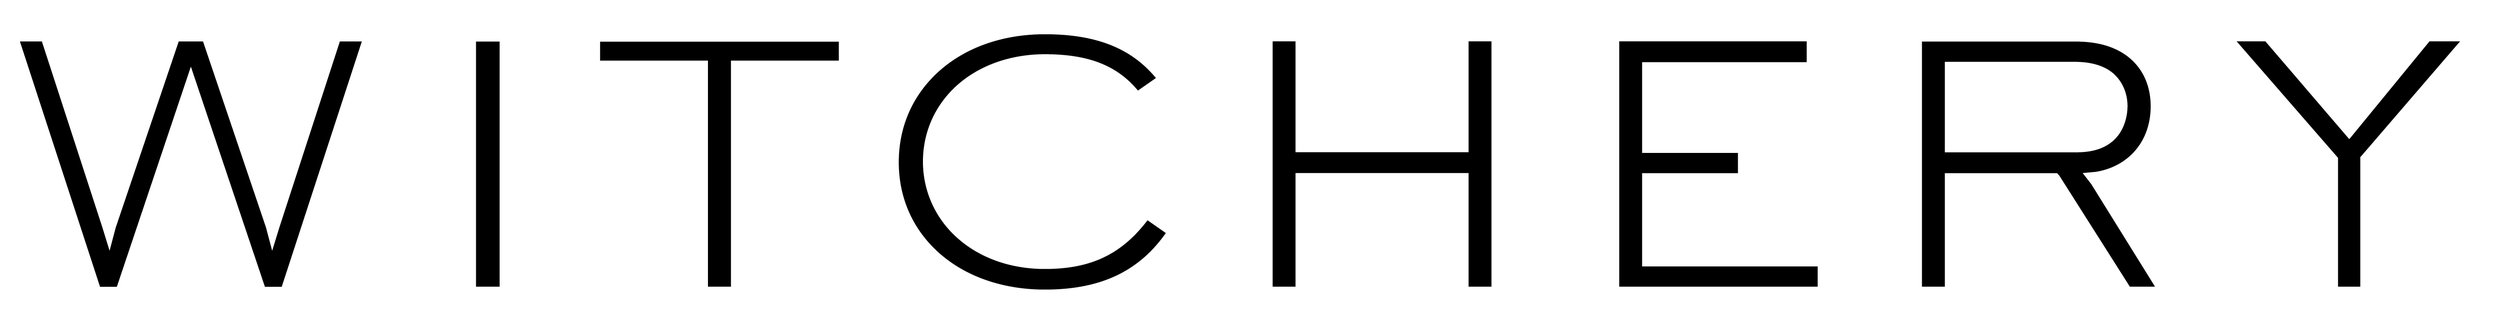 witchery_logo_JPEG.jpg